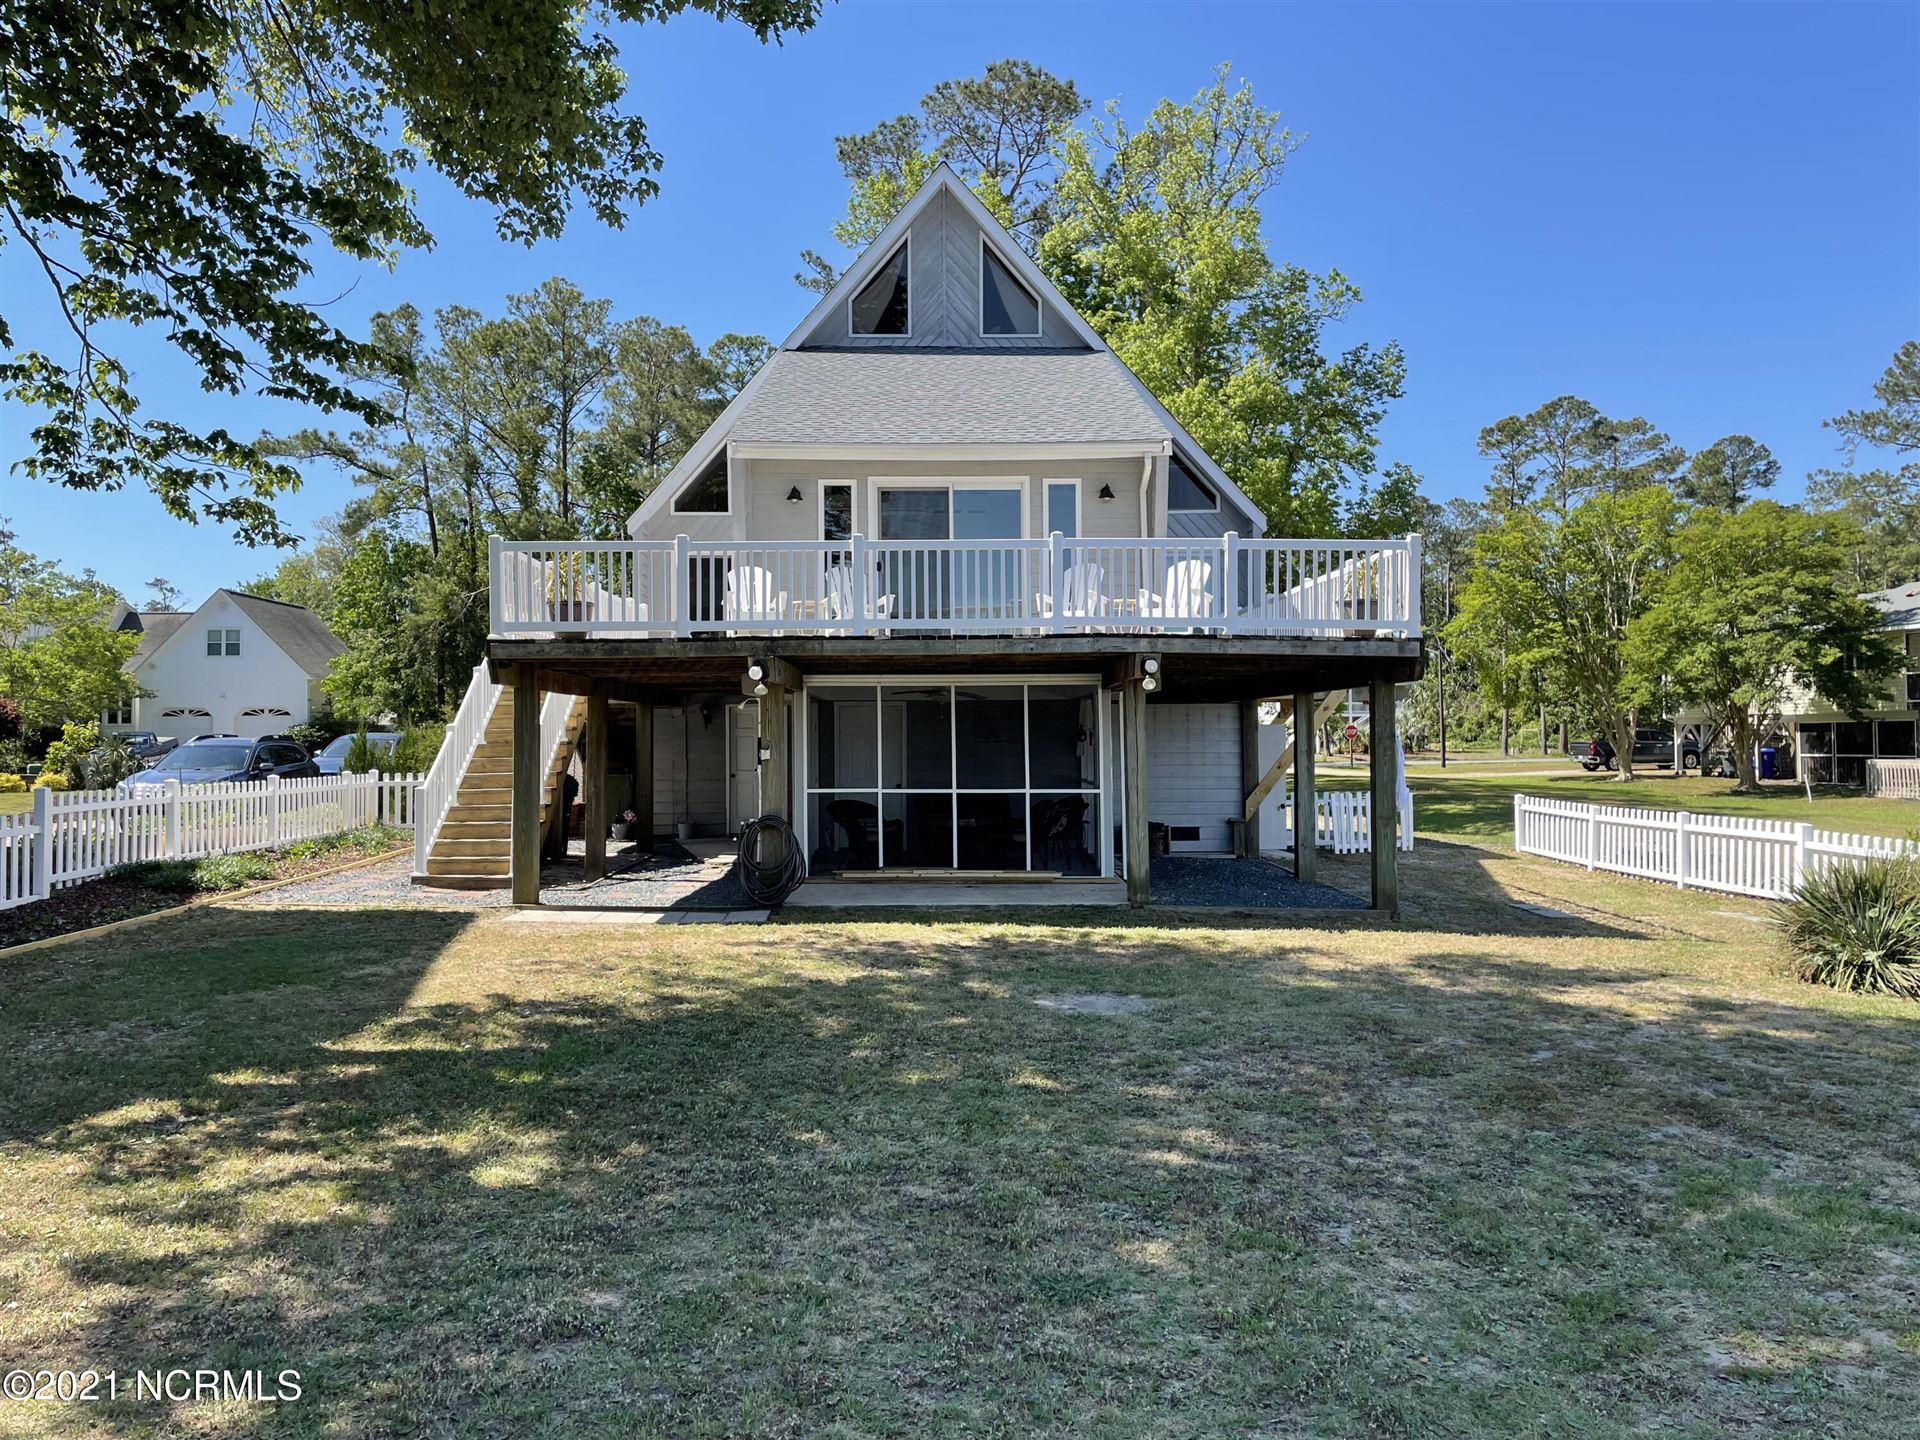 Photo for 1308 W Yacht Drive, Oak Island, NC 28465 (MLS # 100275113)